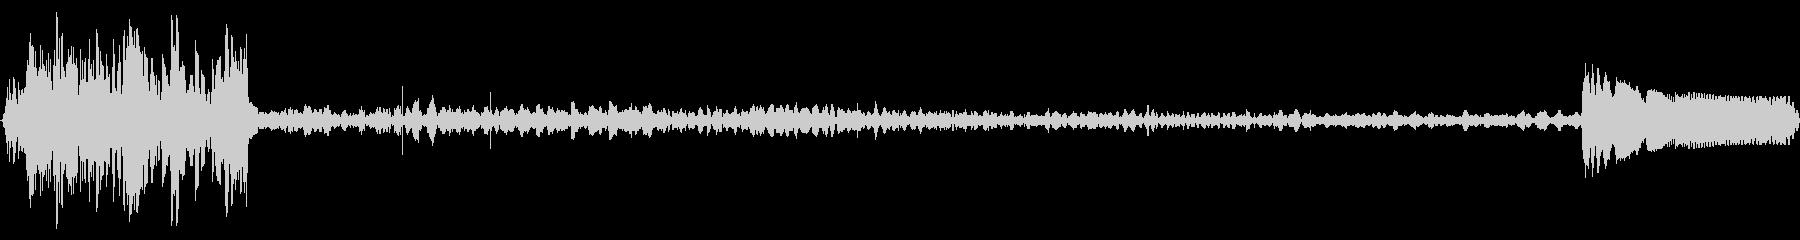 SciFi EC01_89_1の未再生の波形